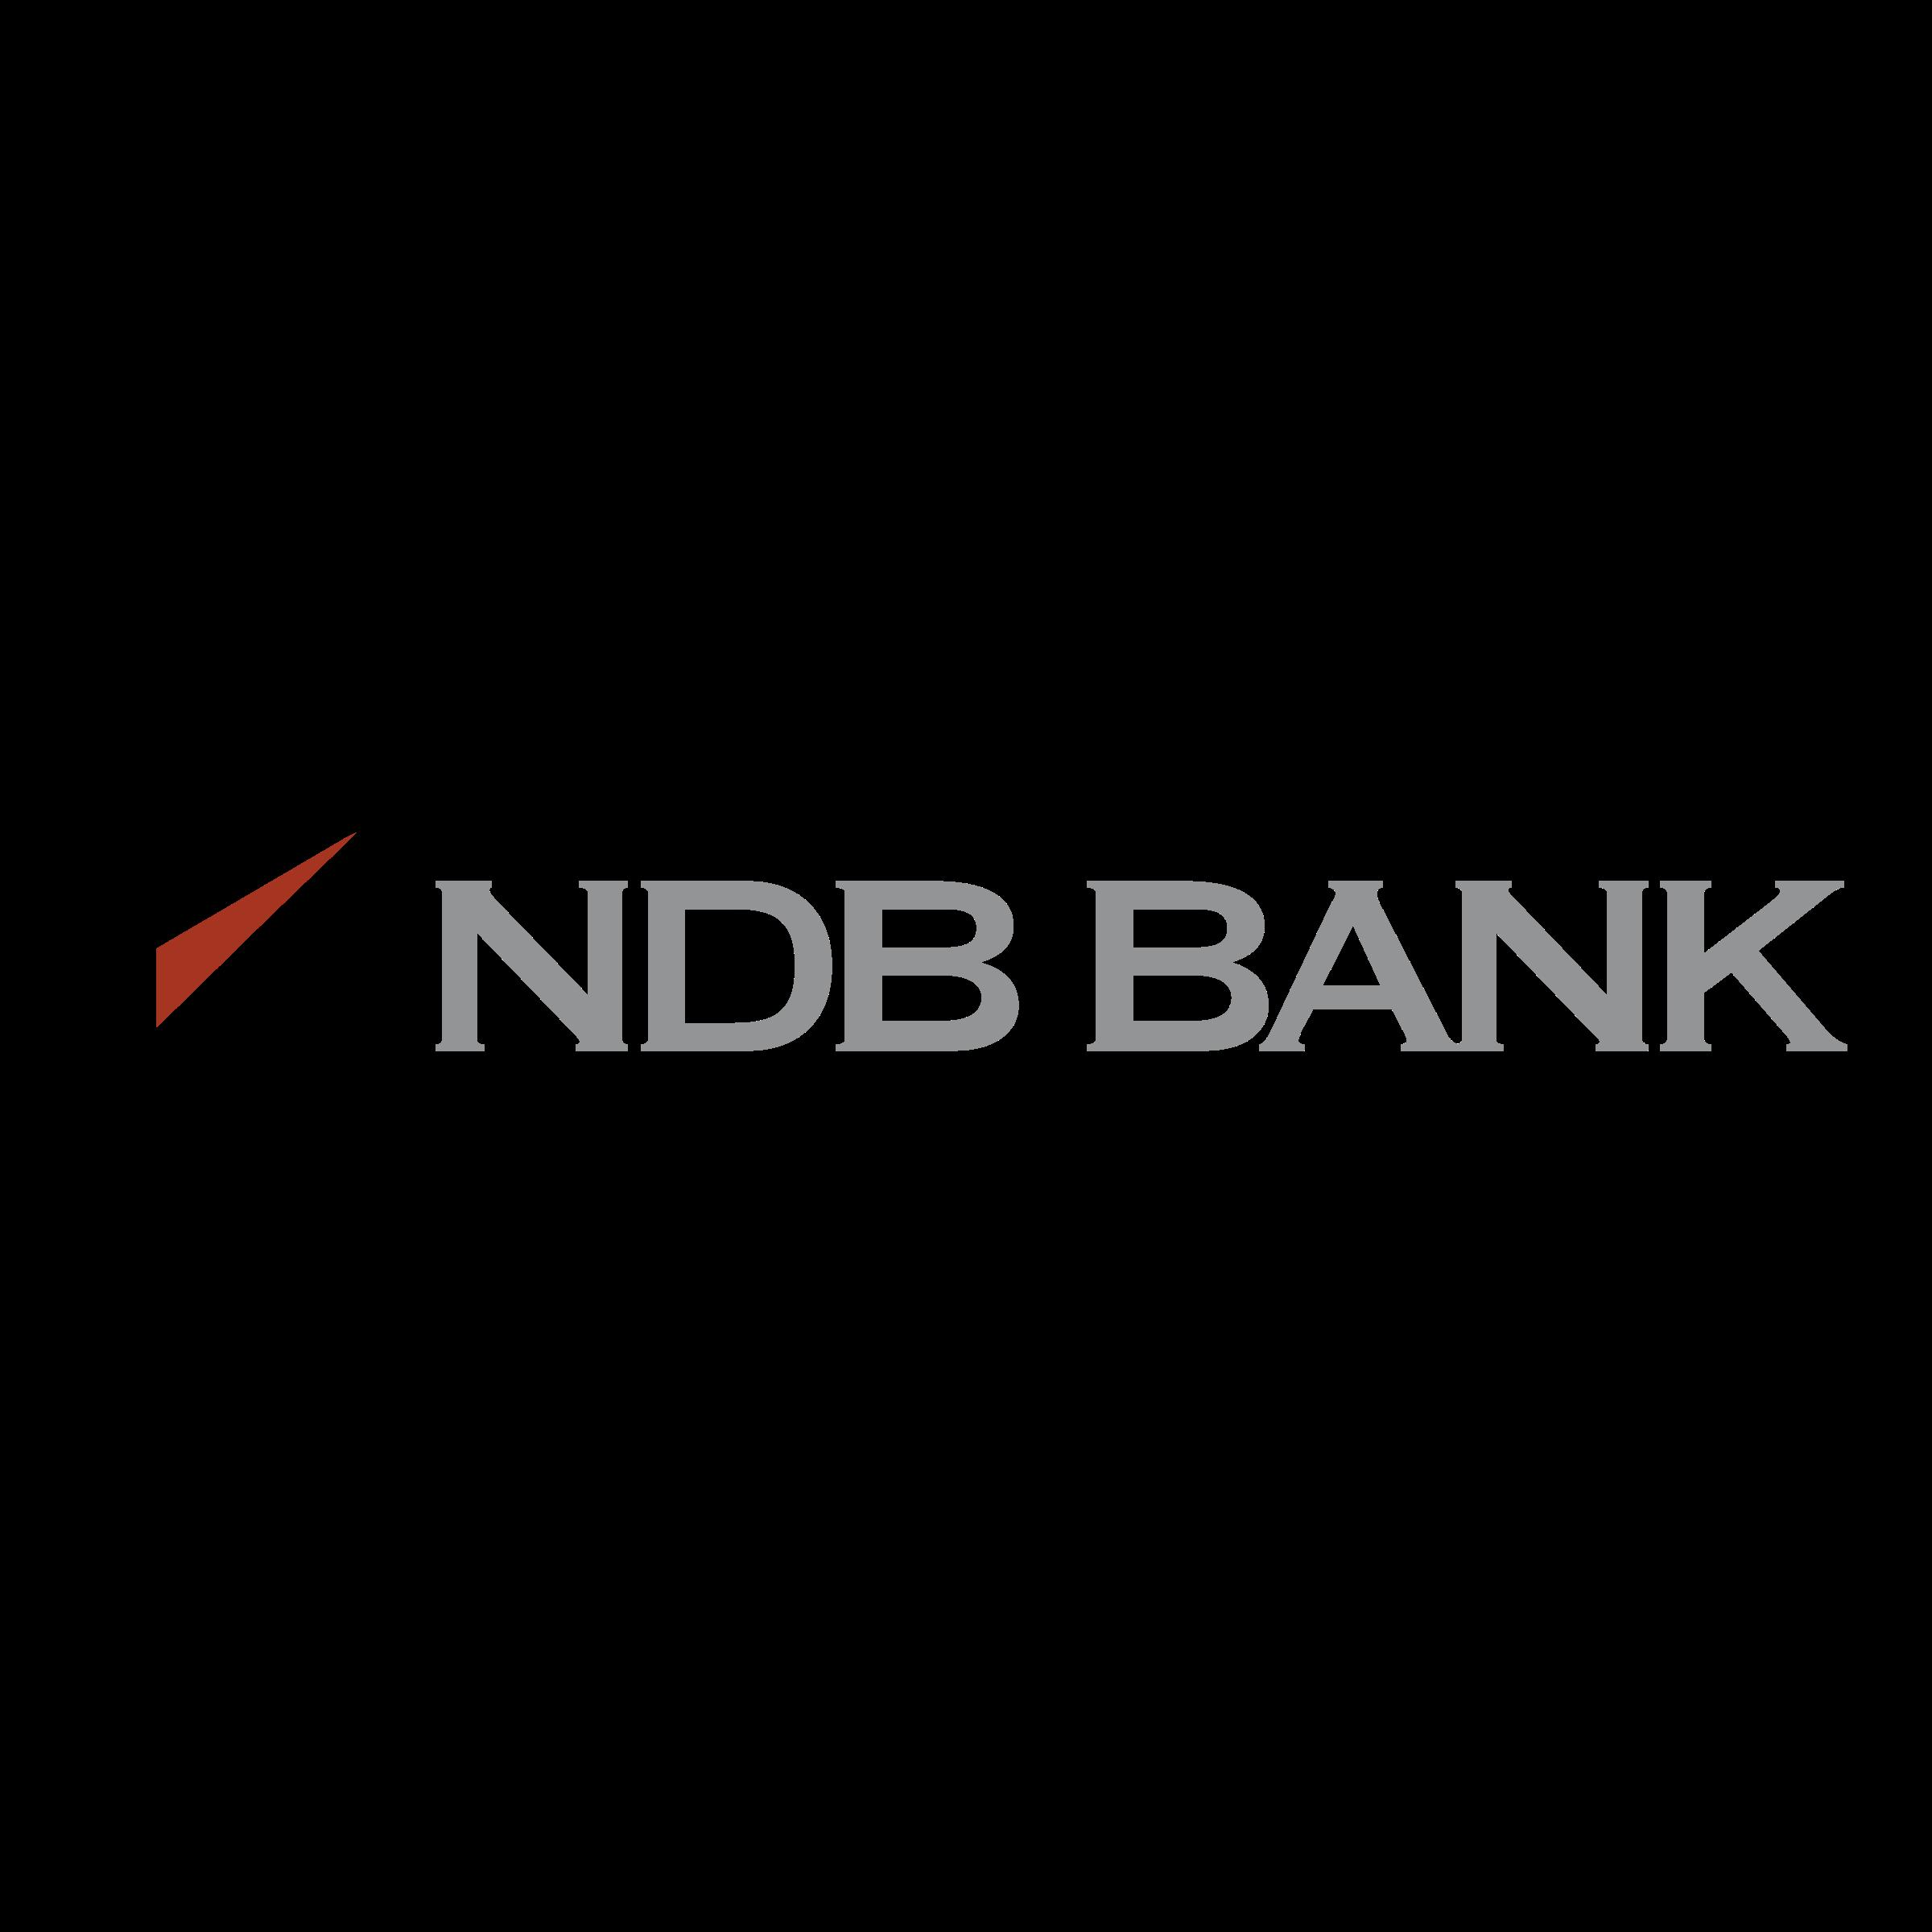 NDB Bank Logo PNG Transparent & SVG Vector.